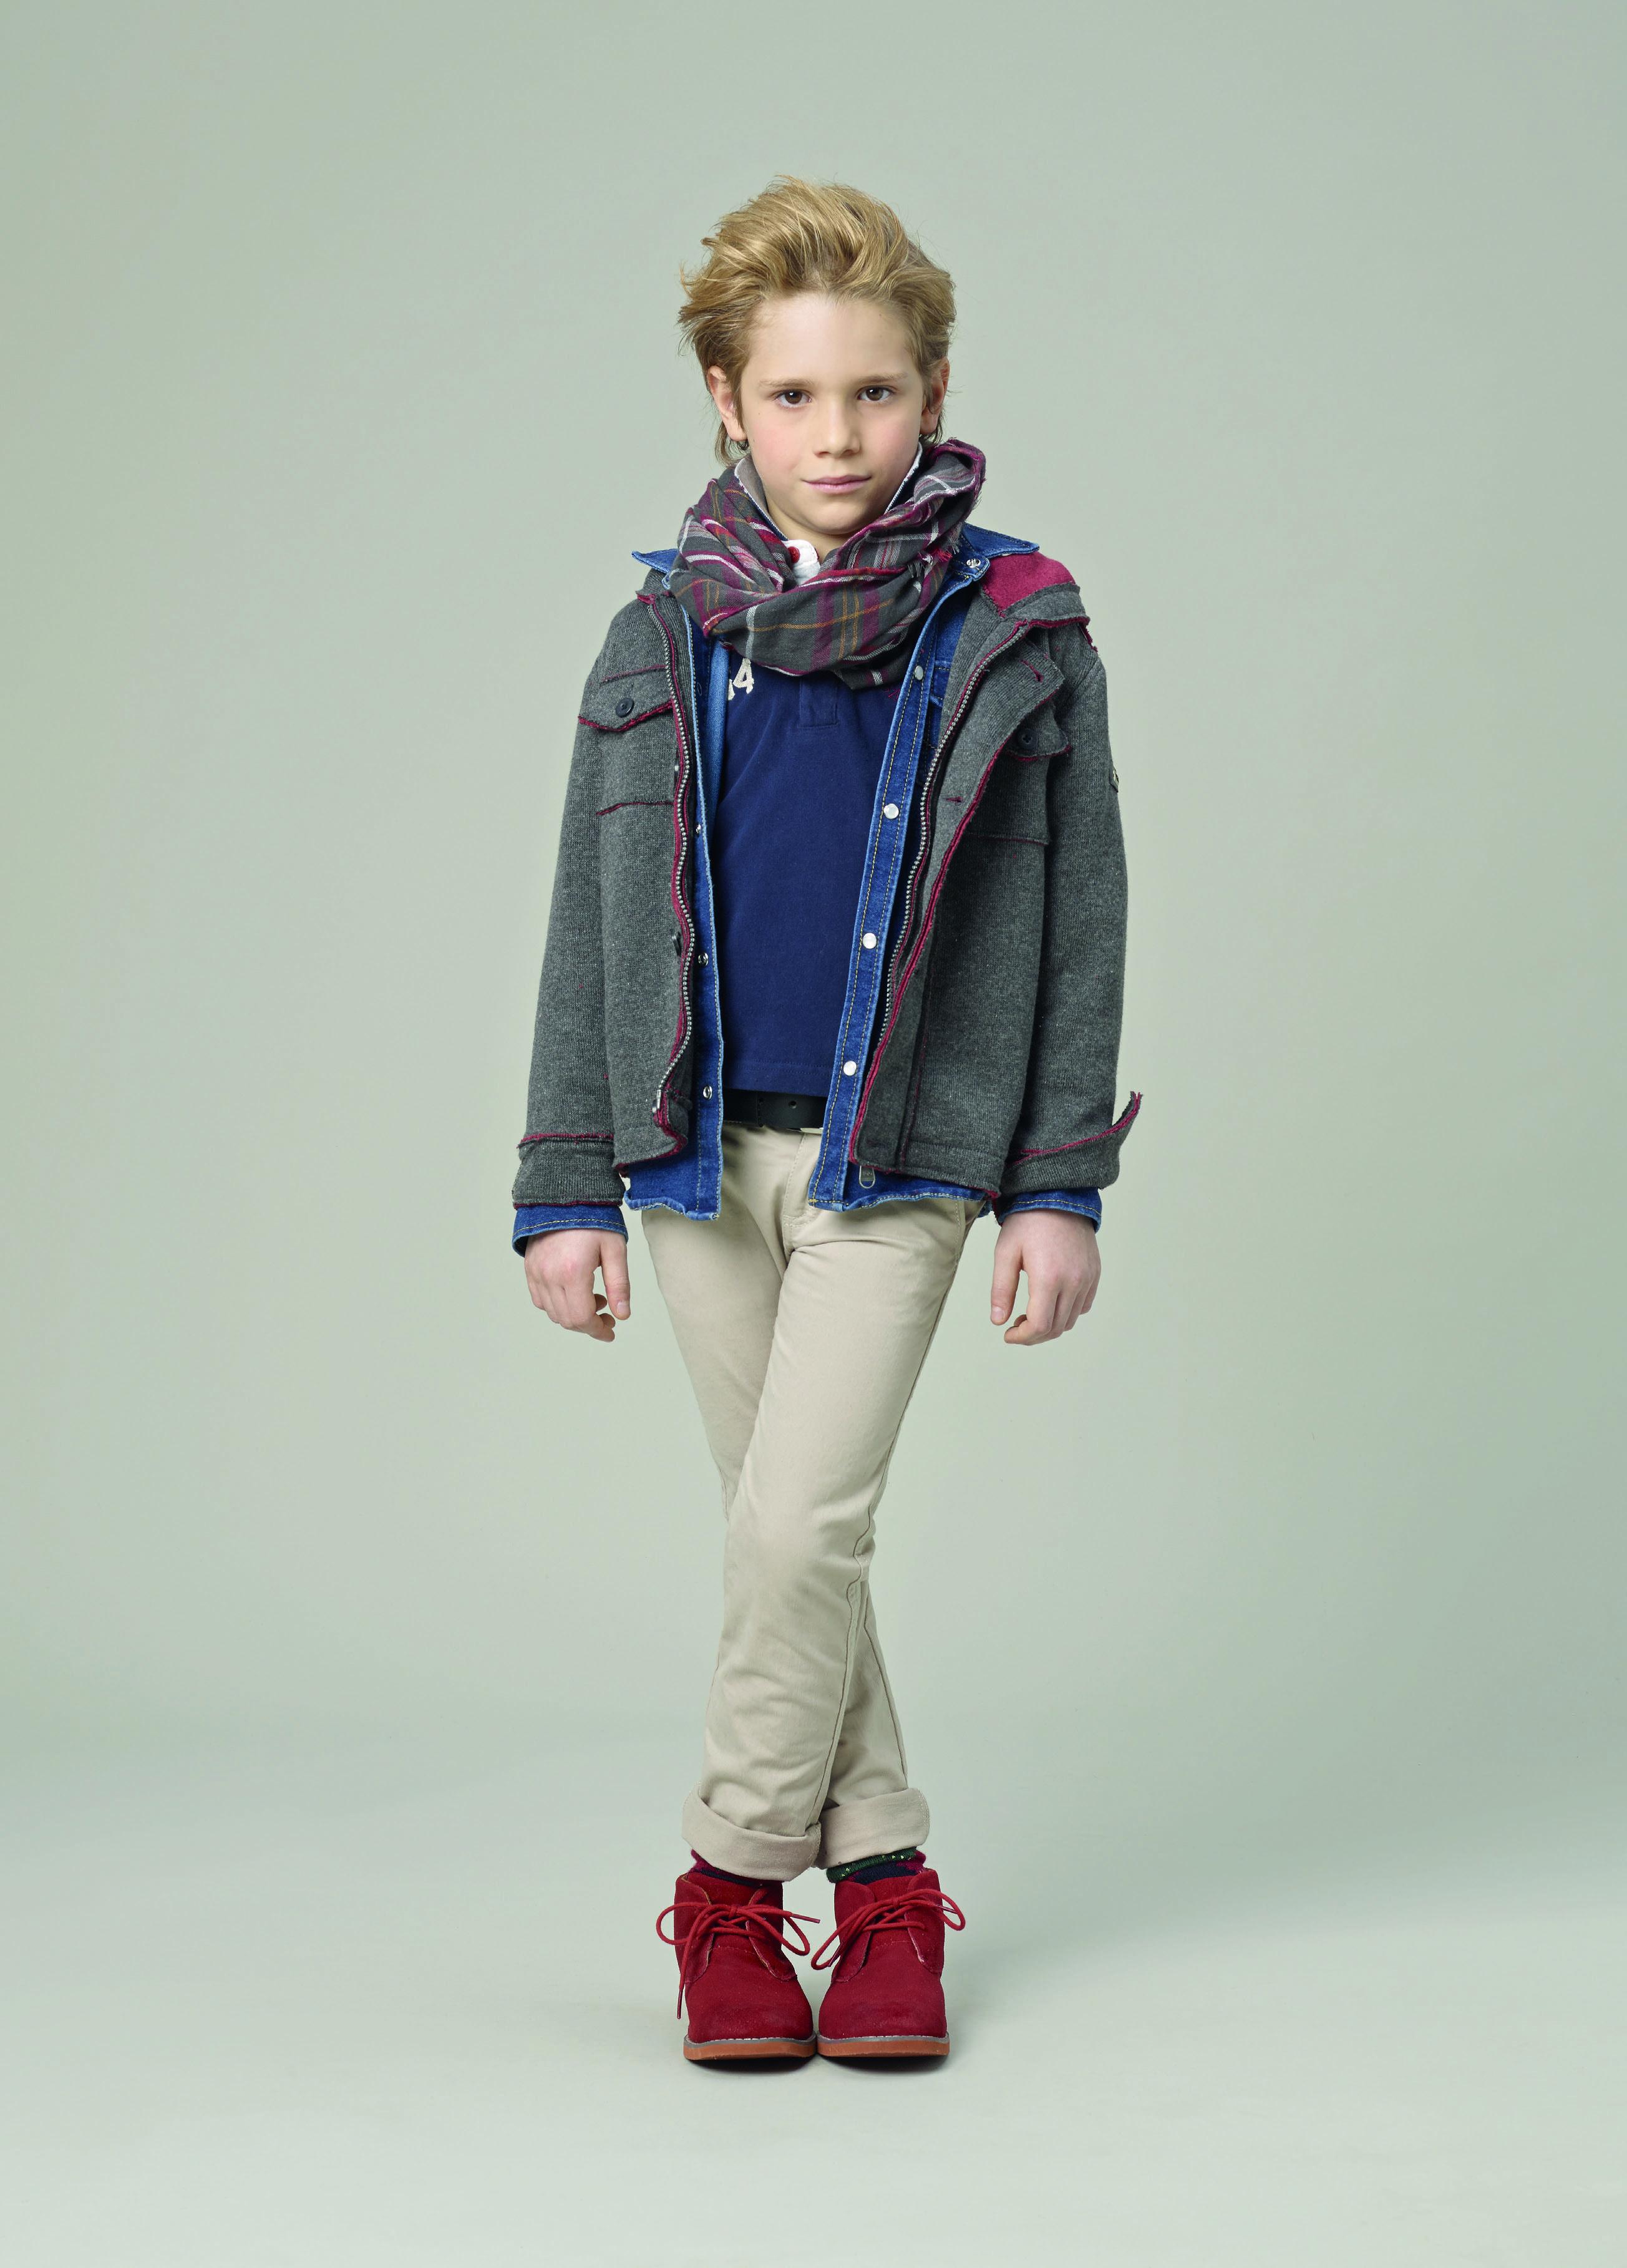 moda infantil ido